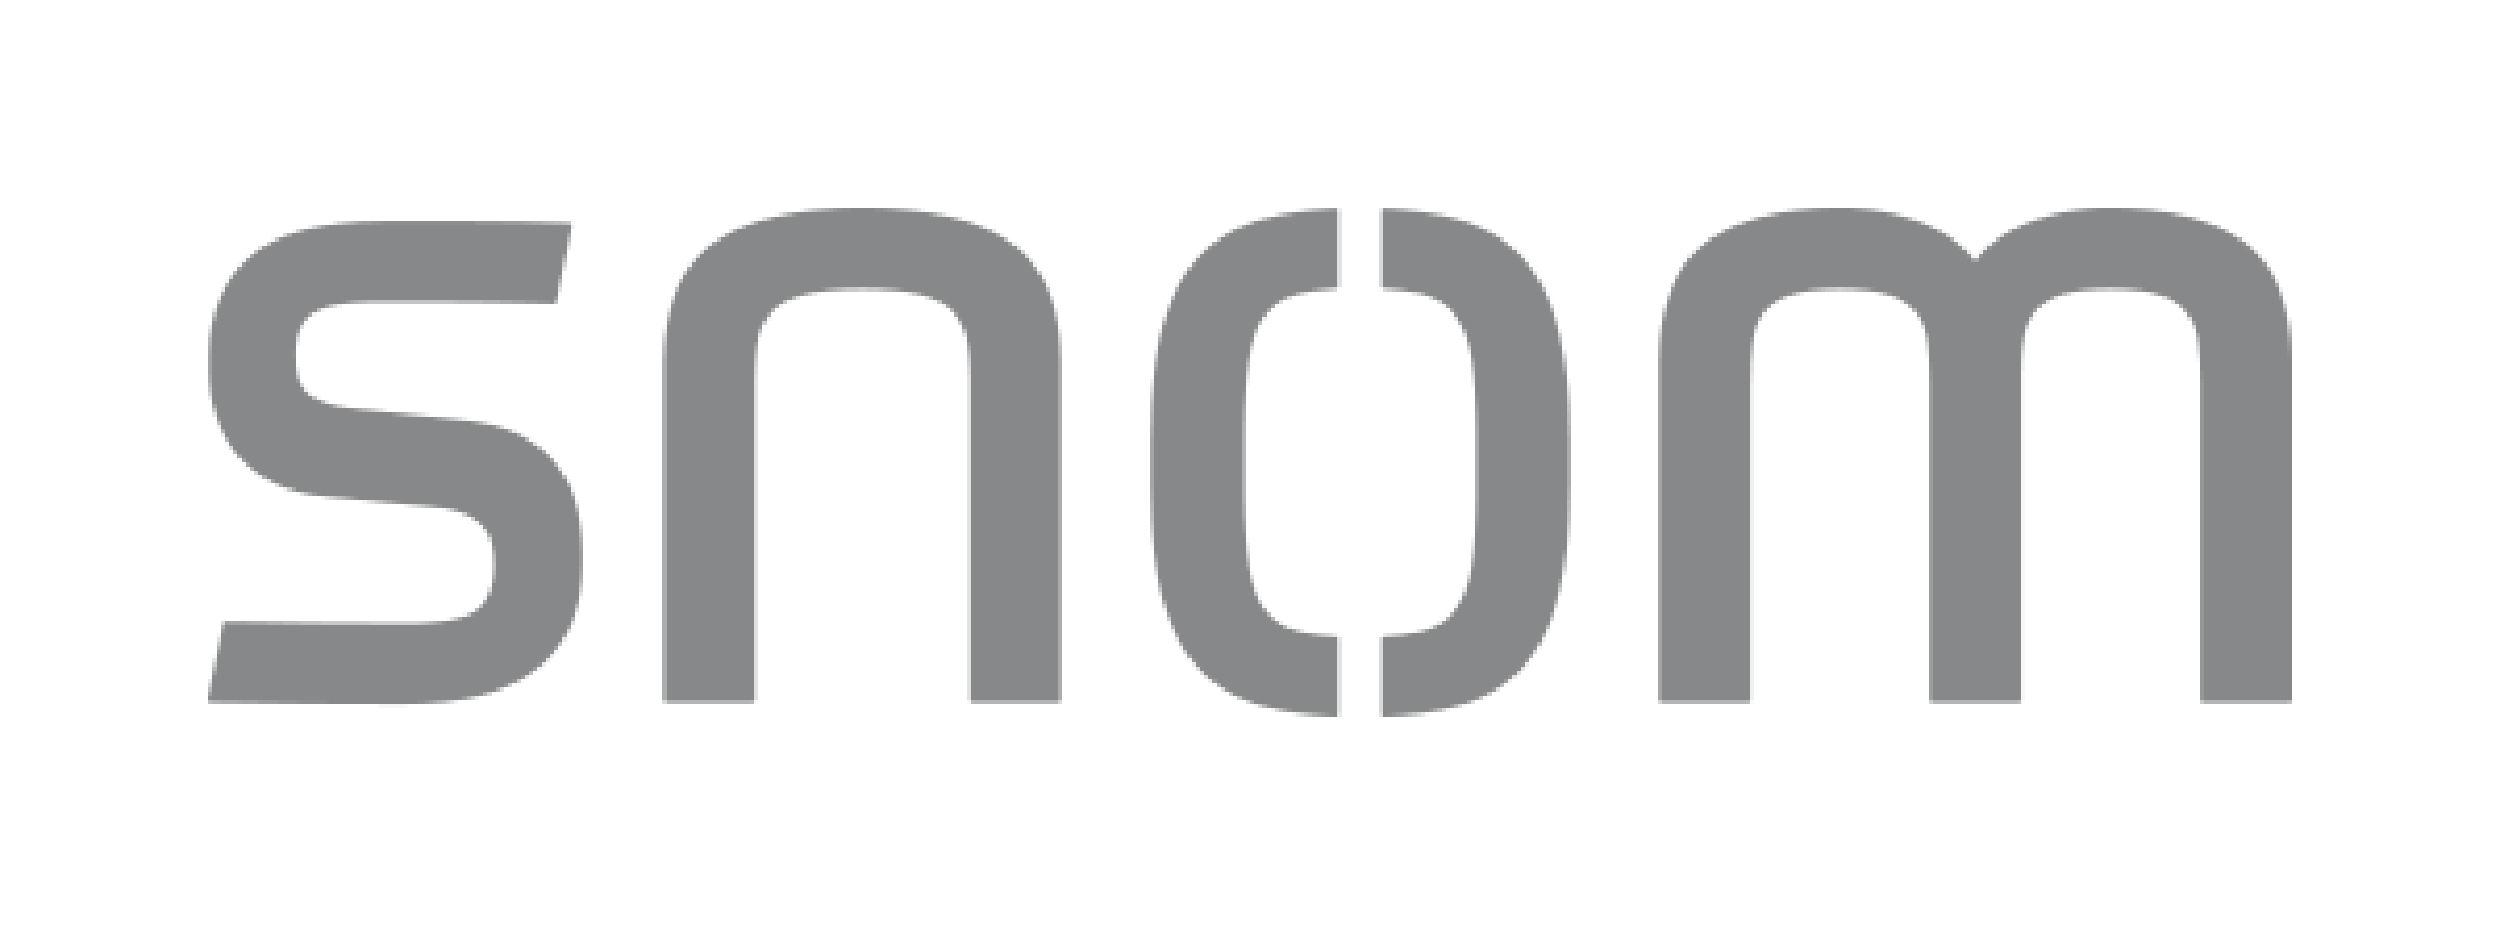 Logo der Snom Technology GmbH